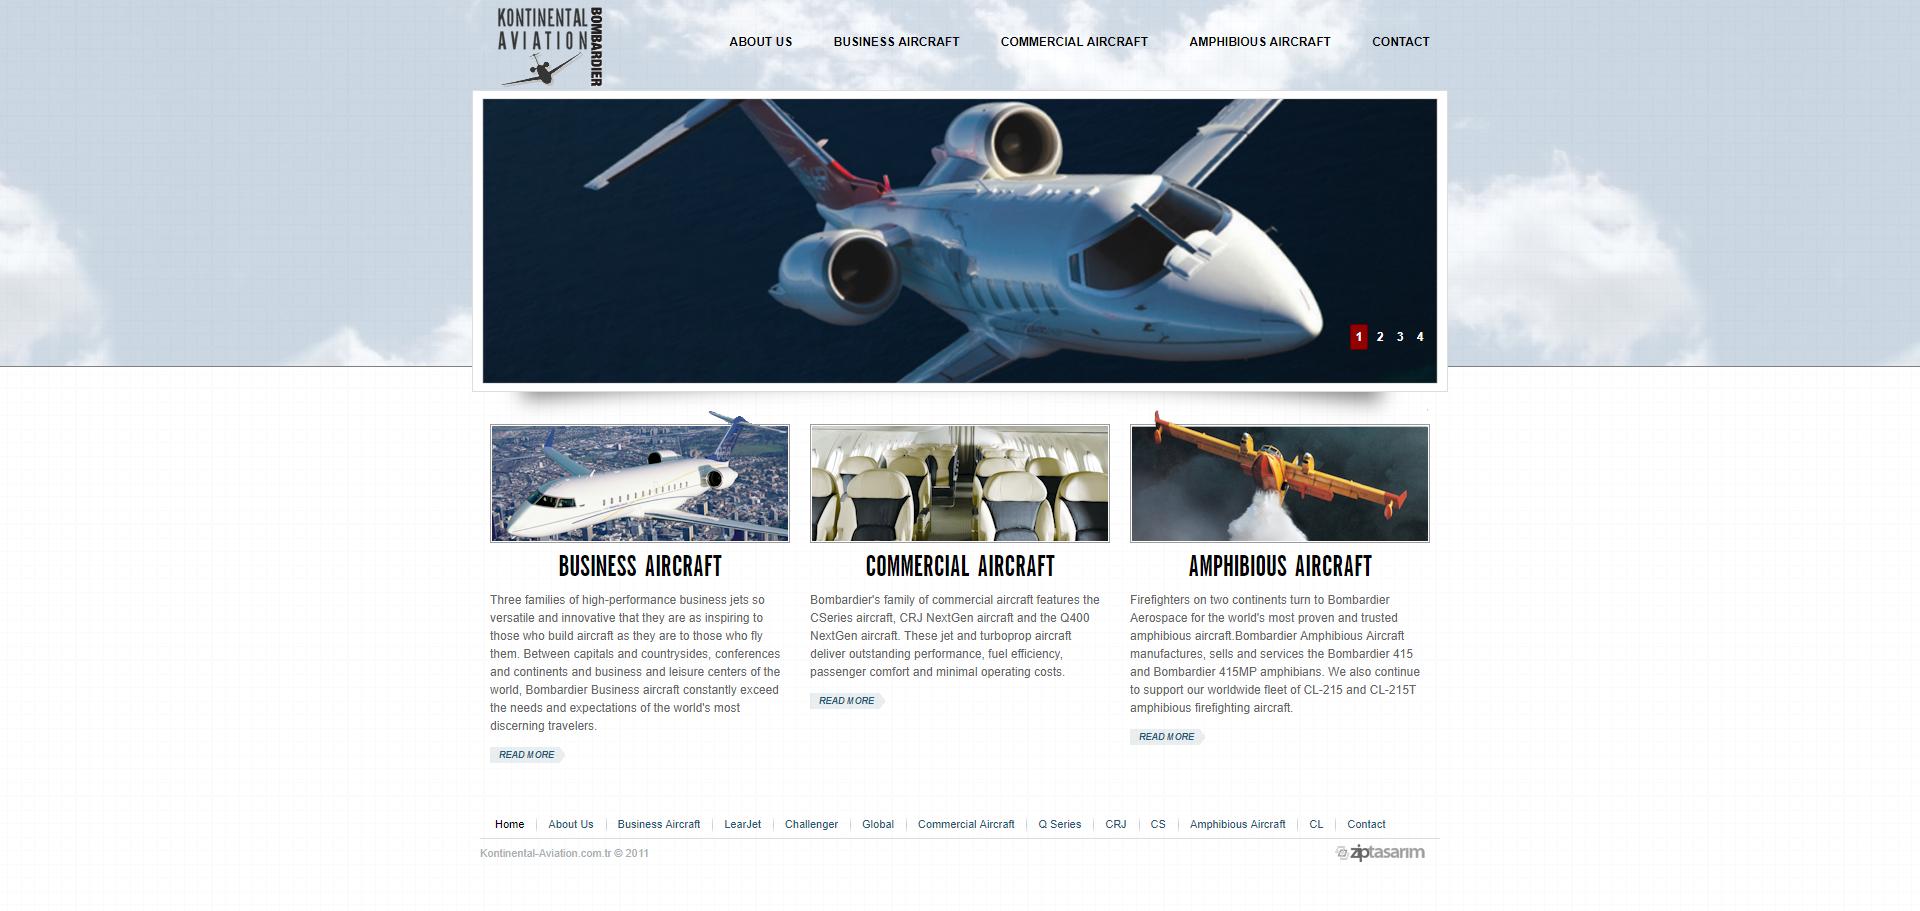 Kontinental Aviation